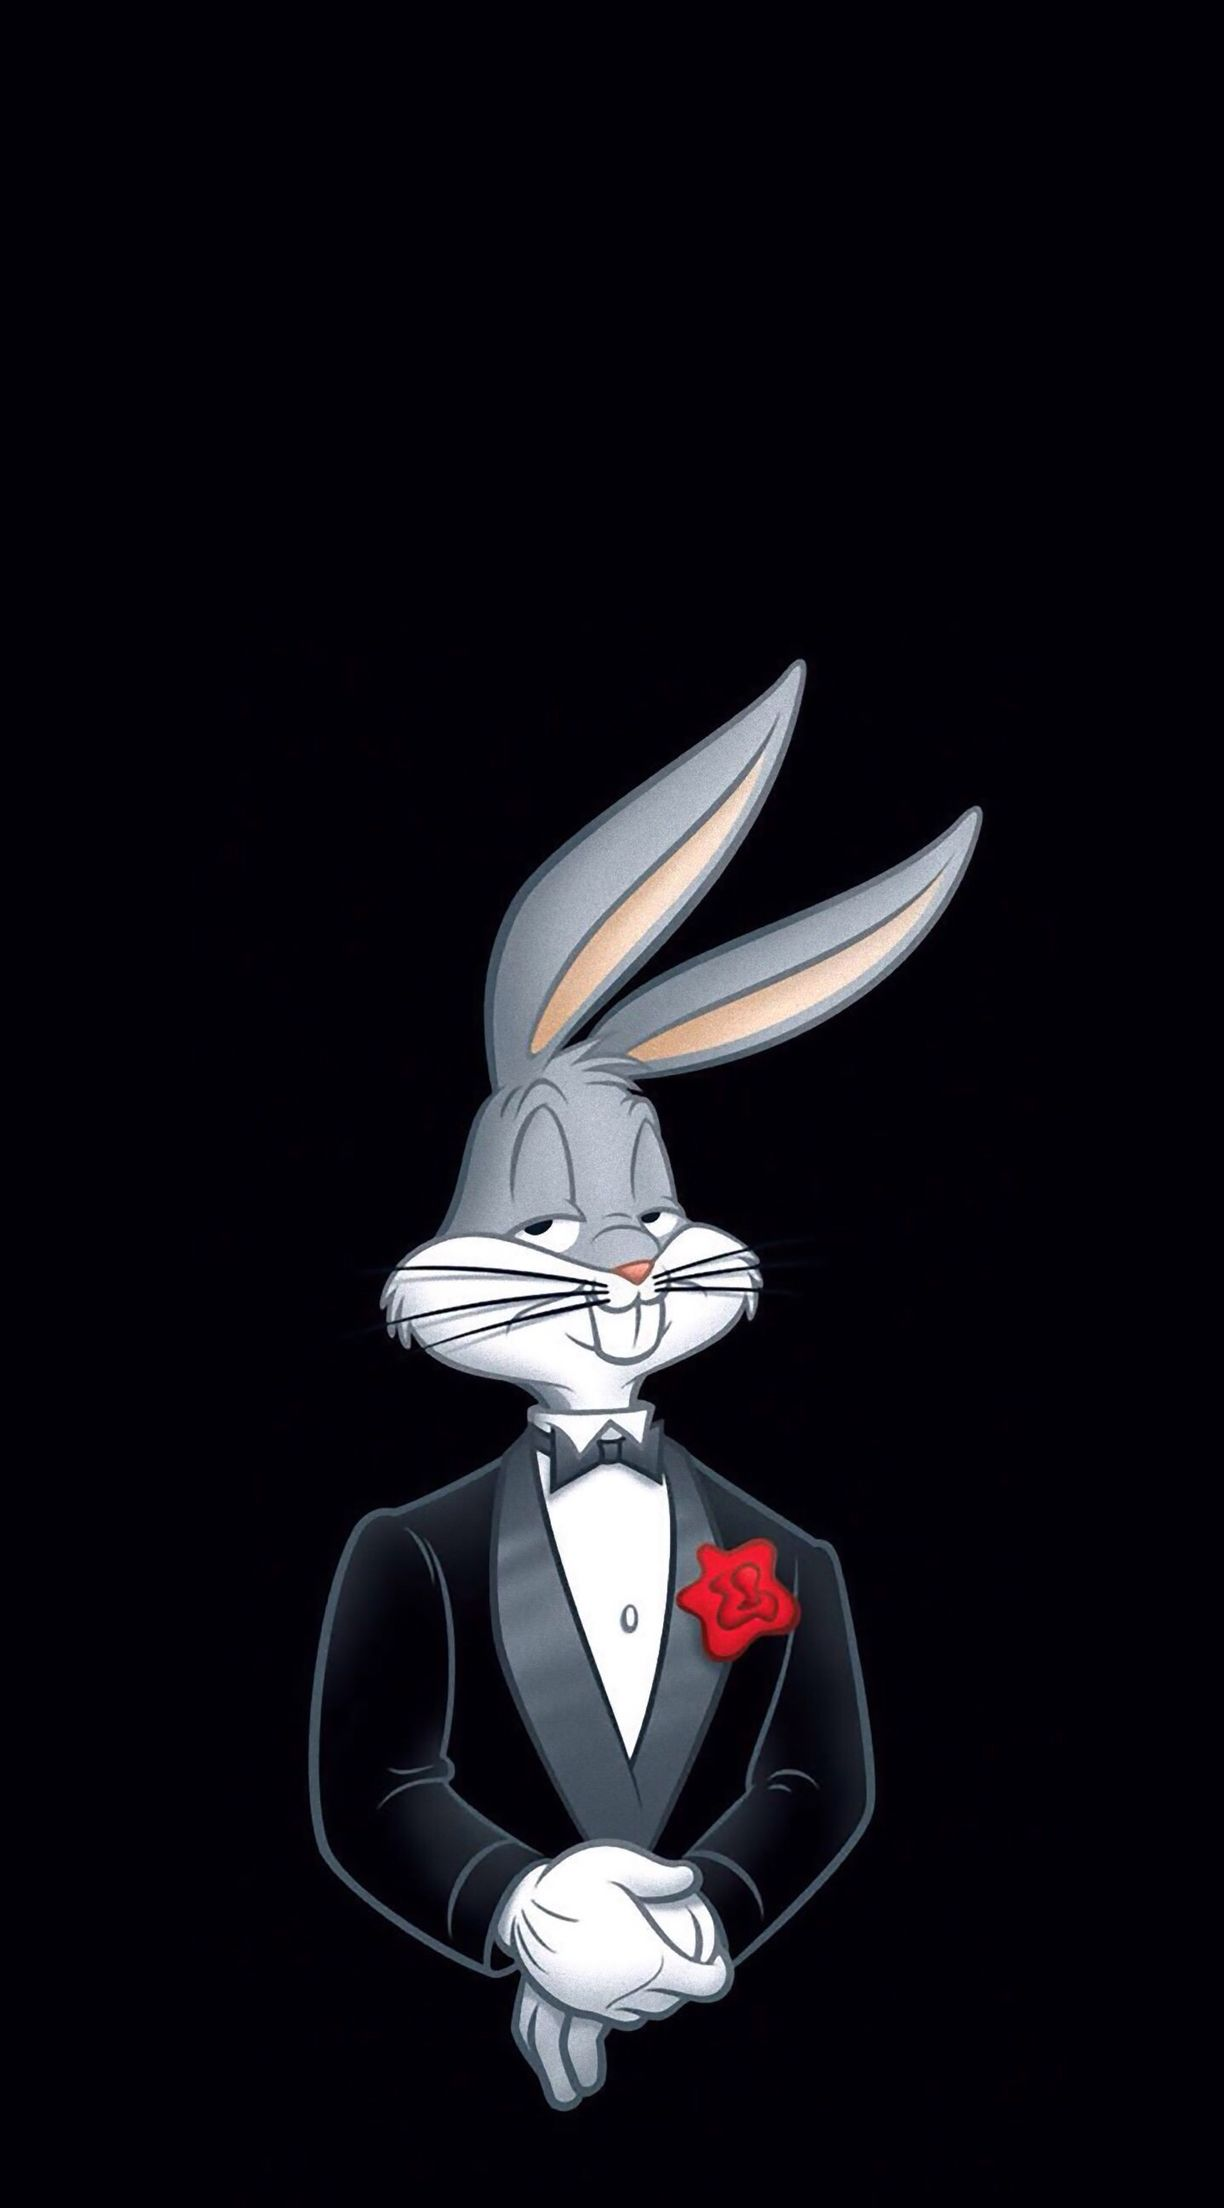 Bugs Bunny Wearing A Tuxedo Art Bugs Bunny Bunny Wallpaper Looney Tunes Wallpaper